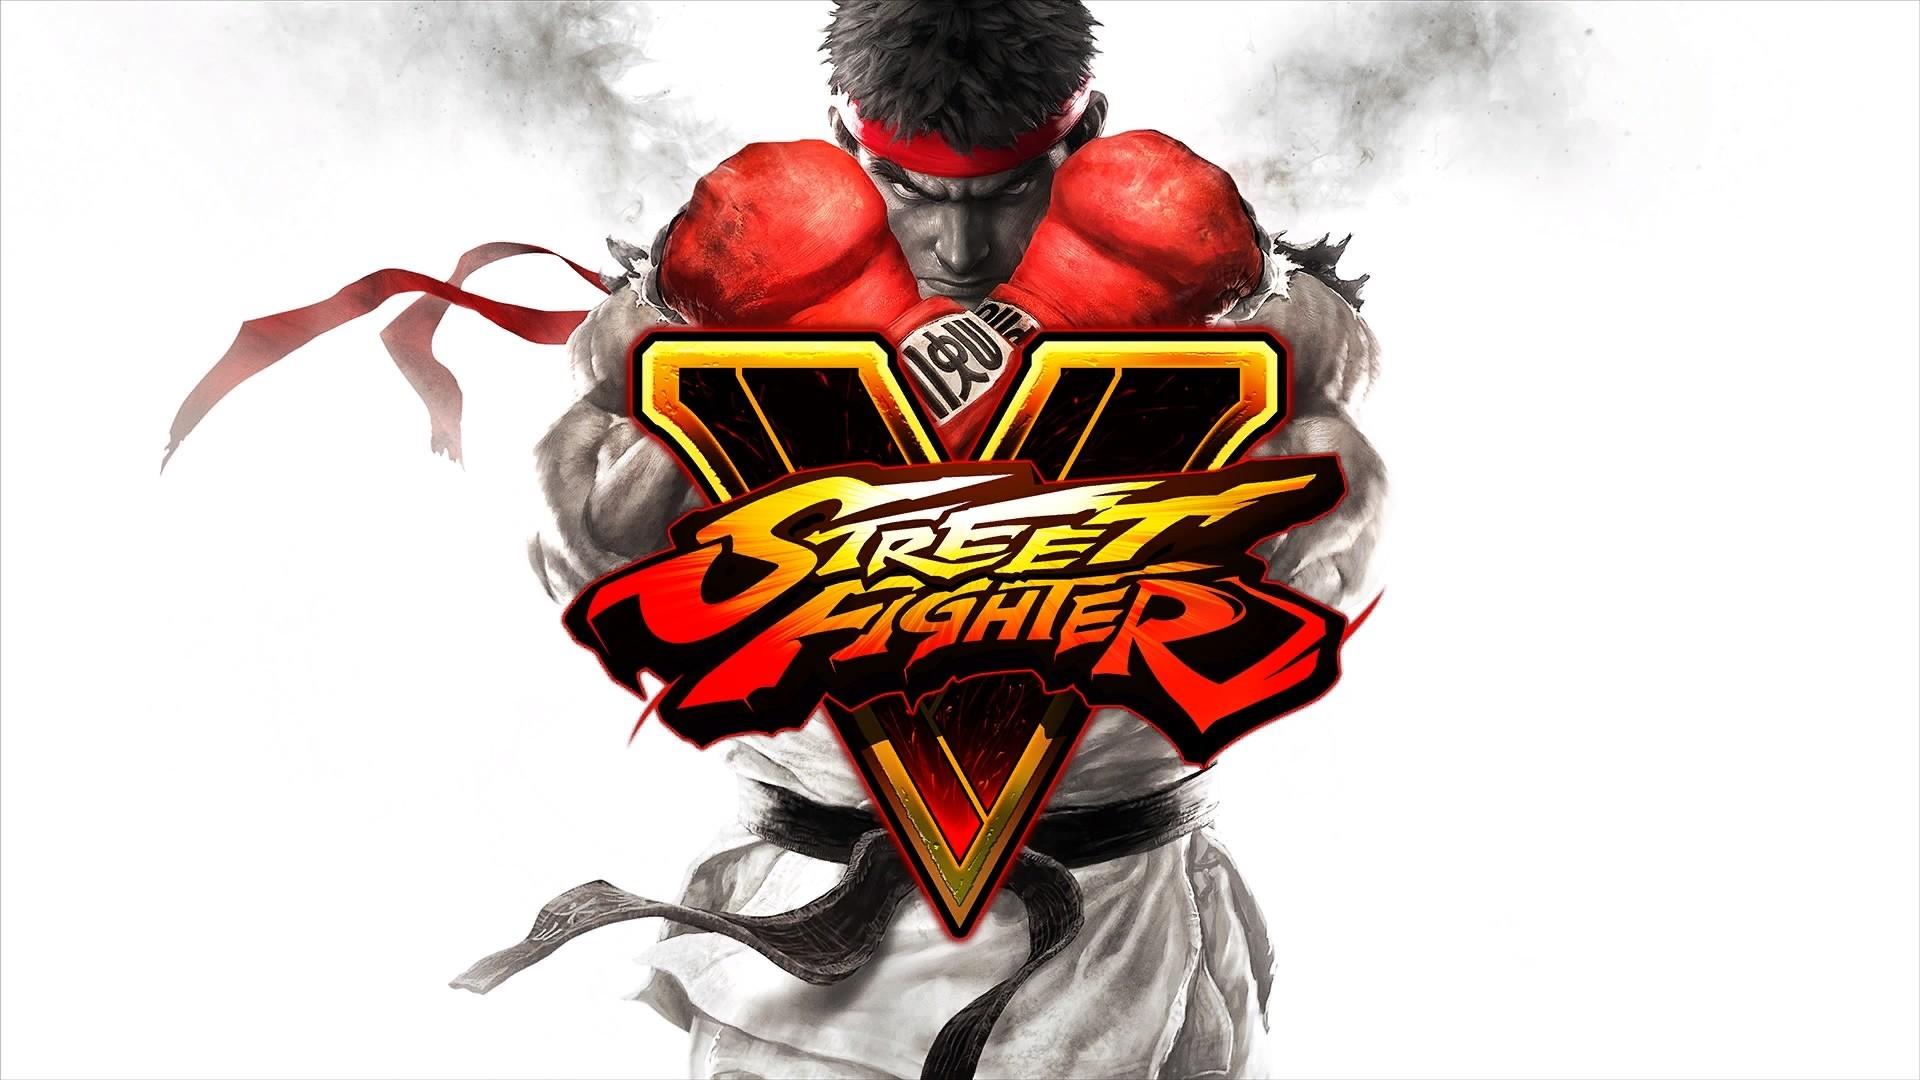 Street Fighter 4 Wallpaper (62+ images)